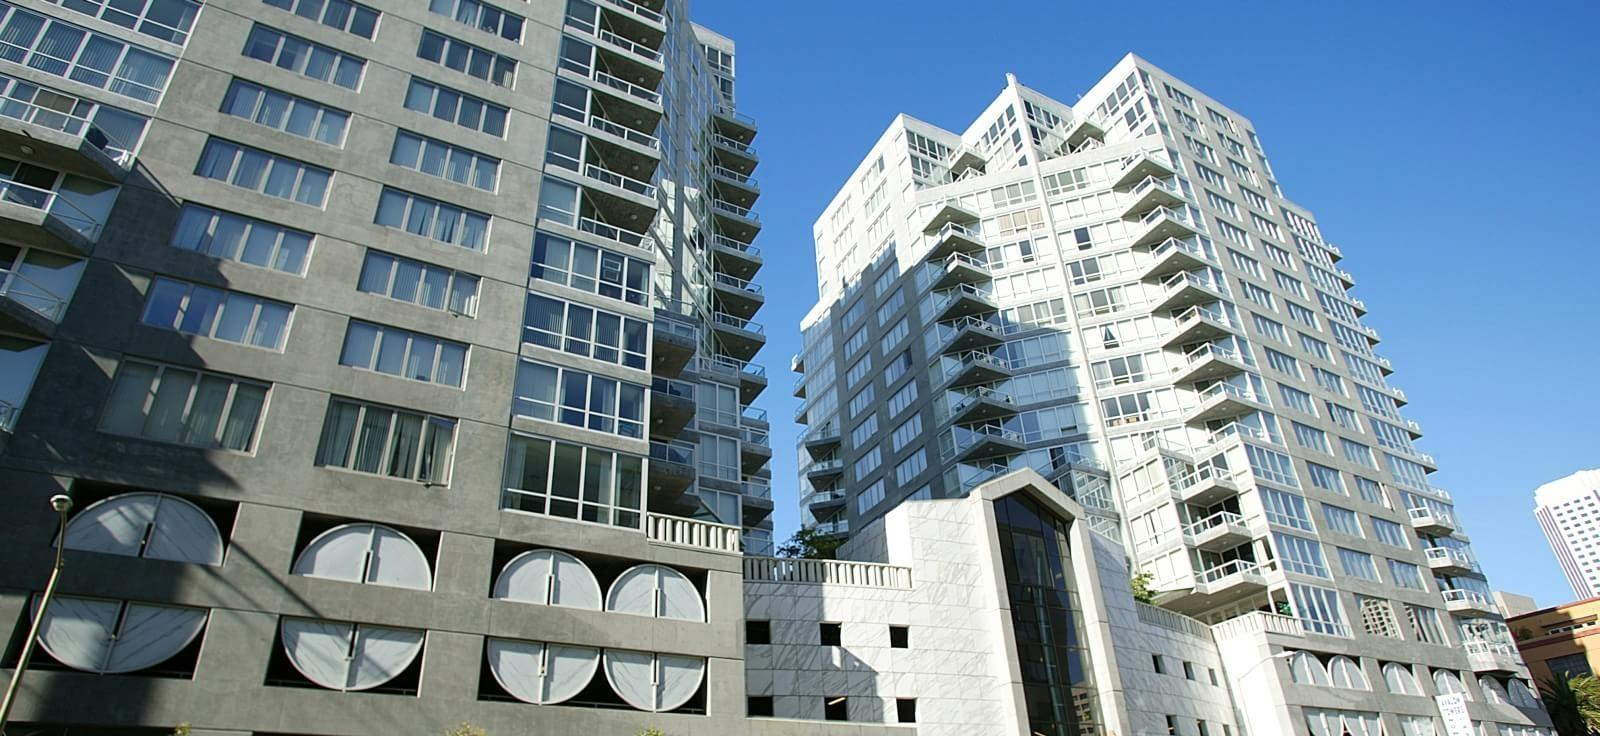 388 Beale Apartments photo #1